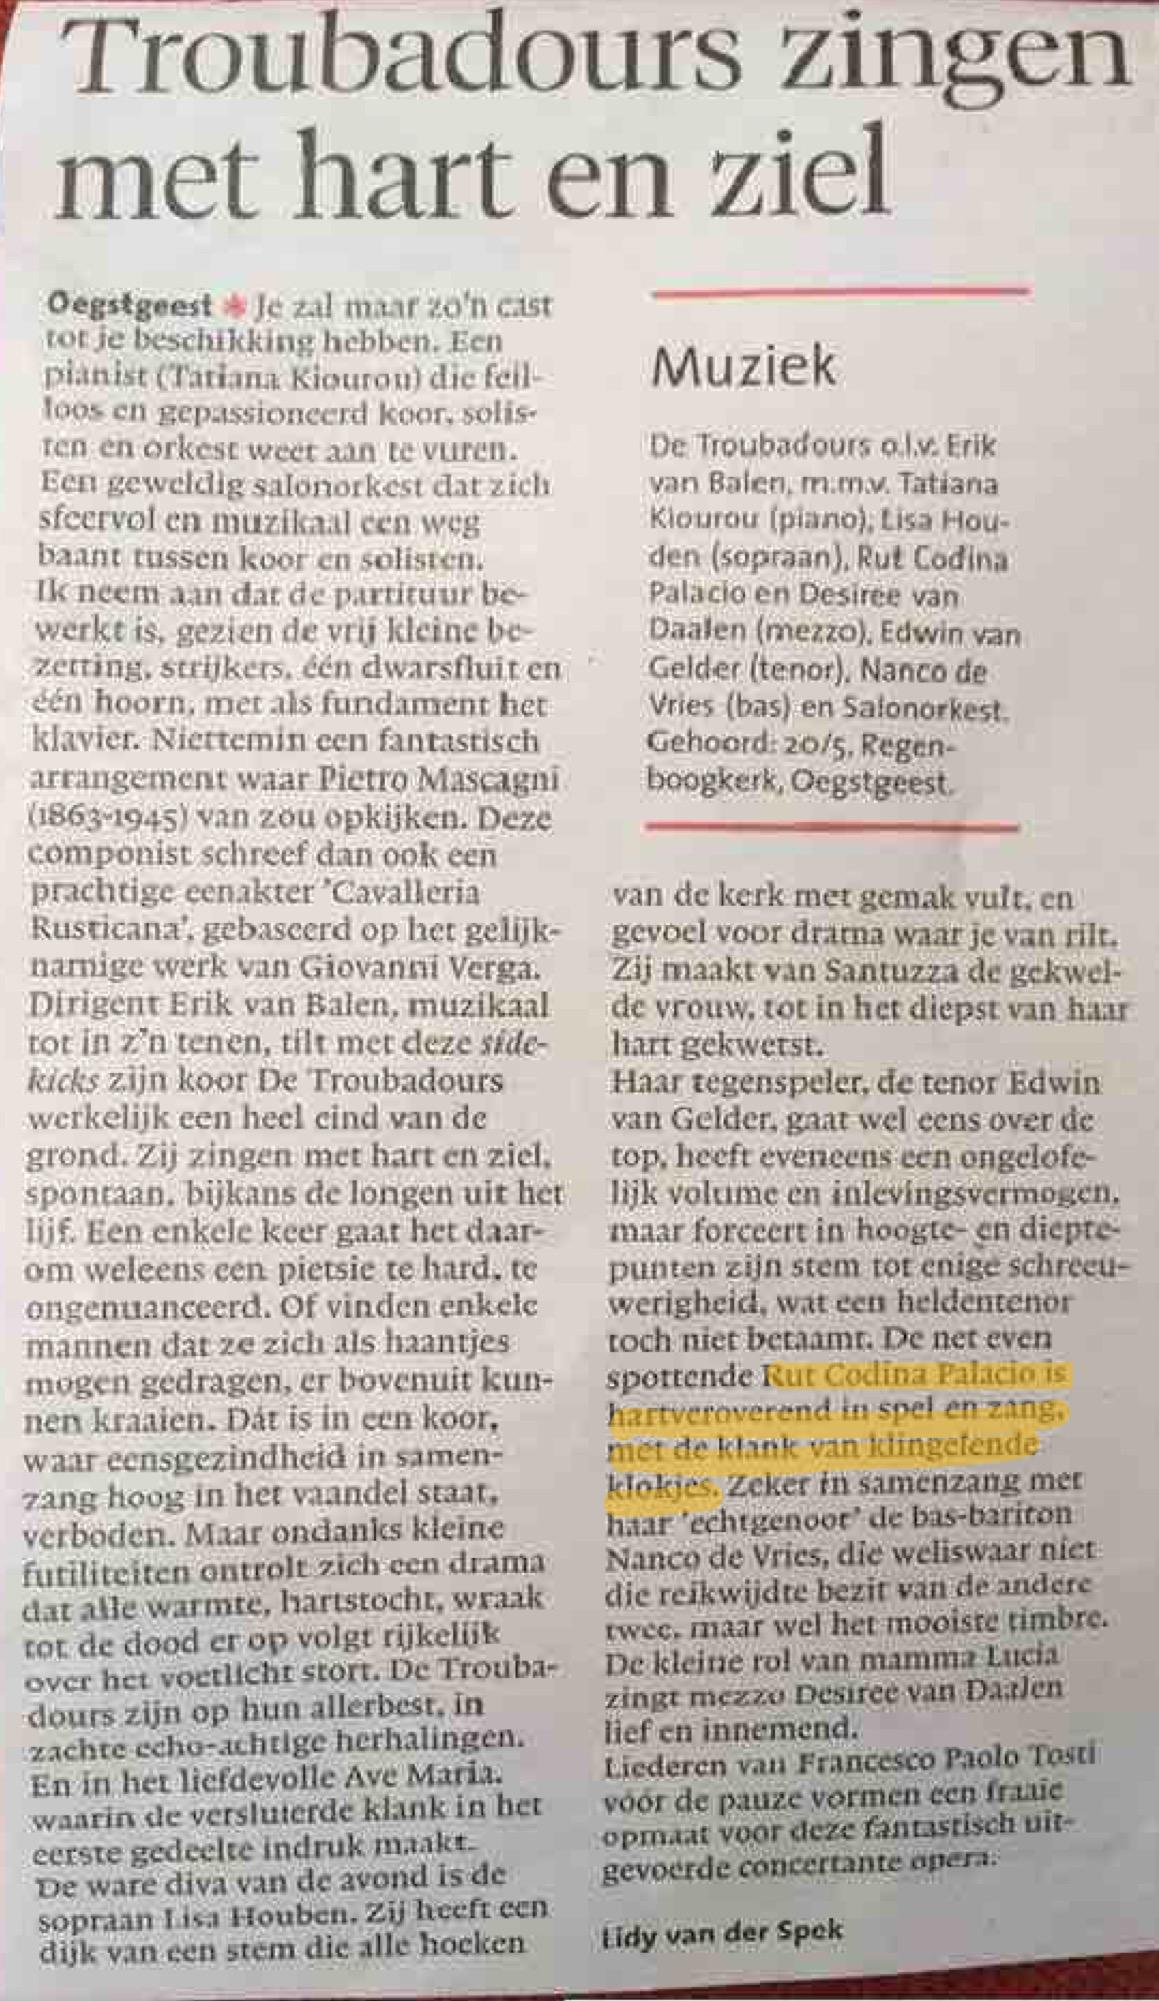 Leidsche Dagblad 26/05/2016